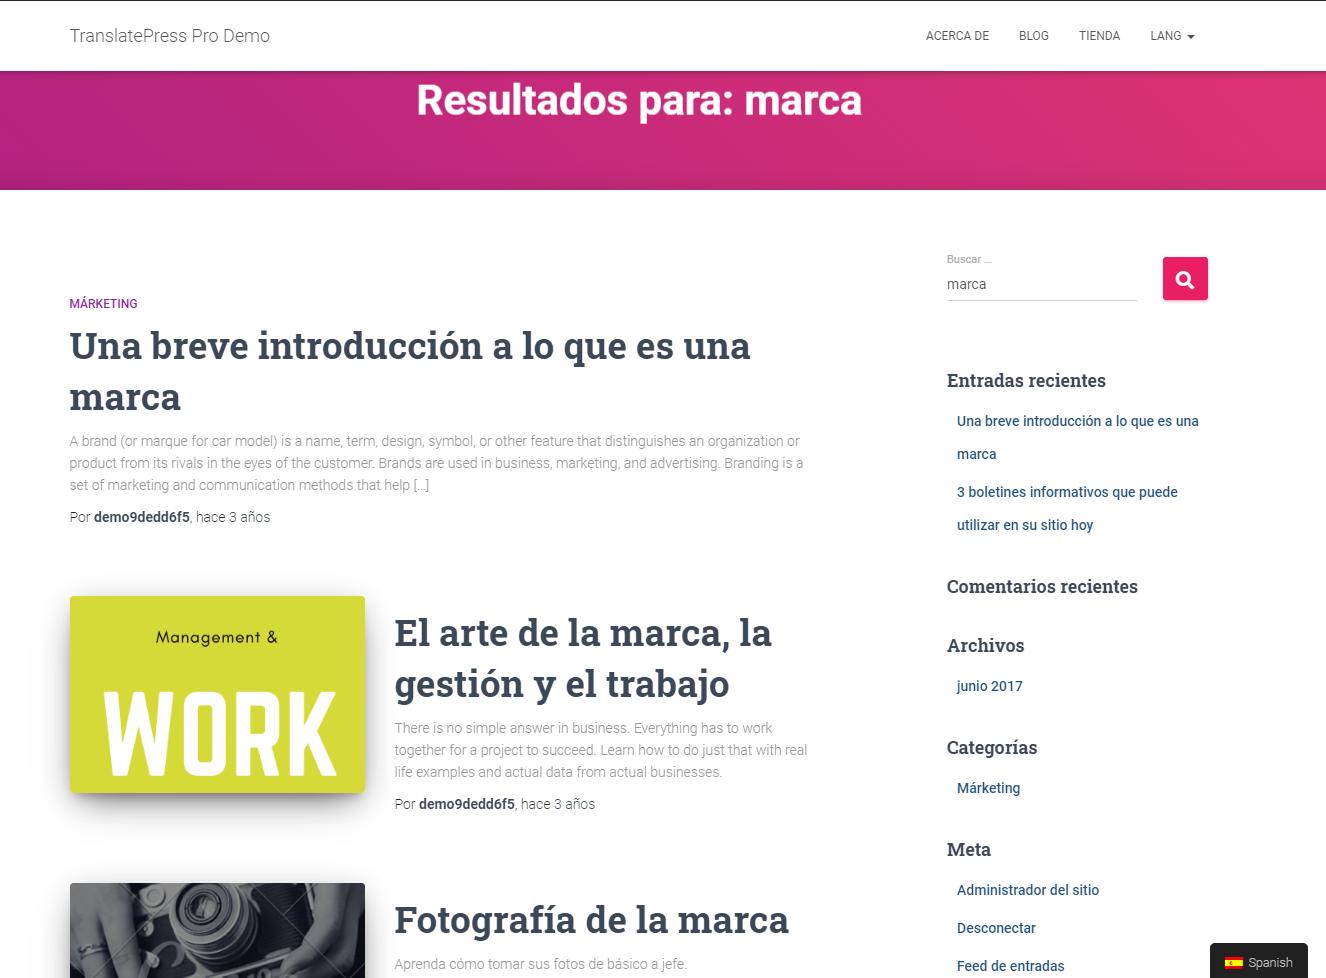 Multilingual WordPress Search results using TranslatePress